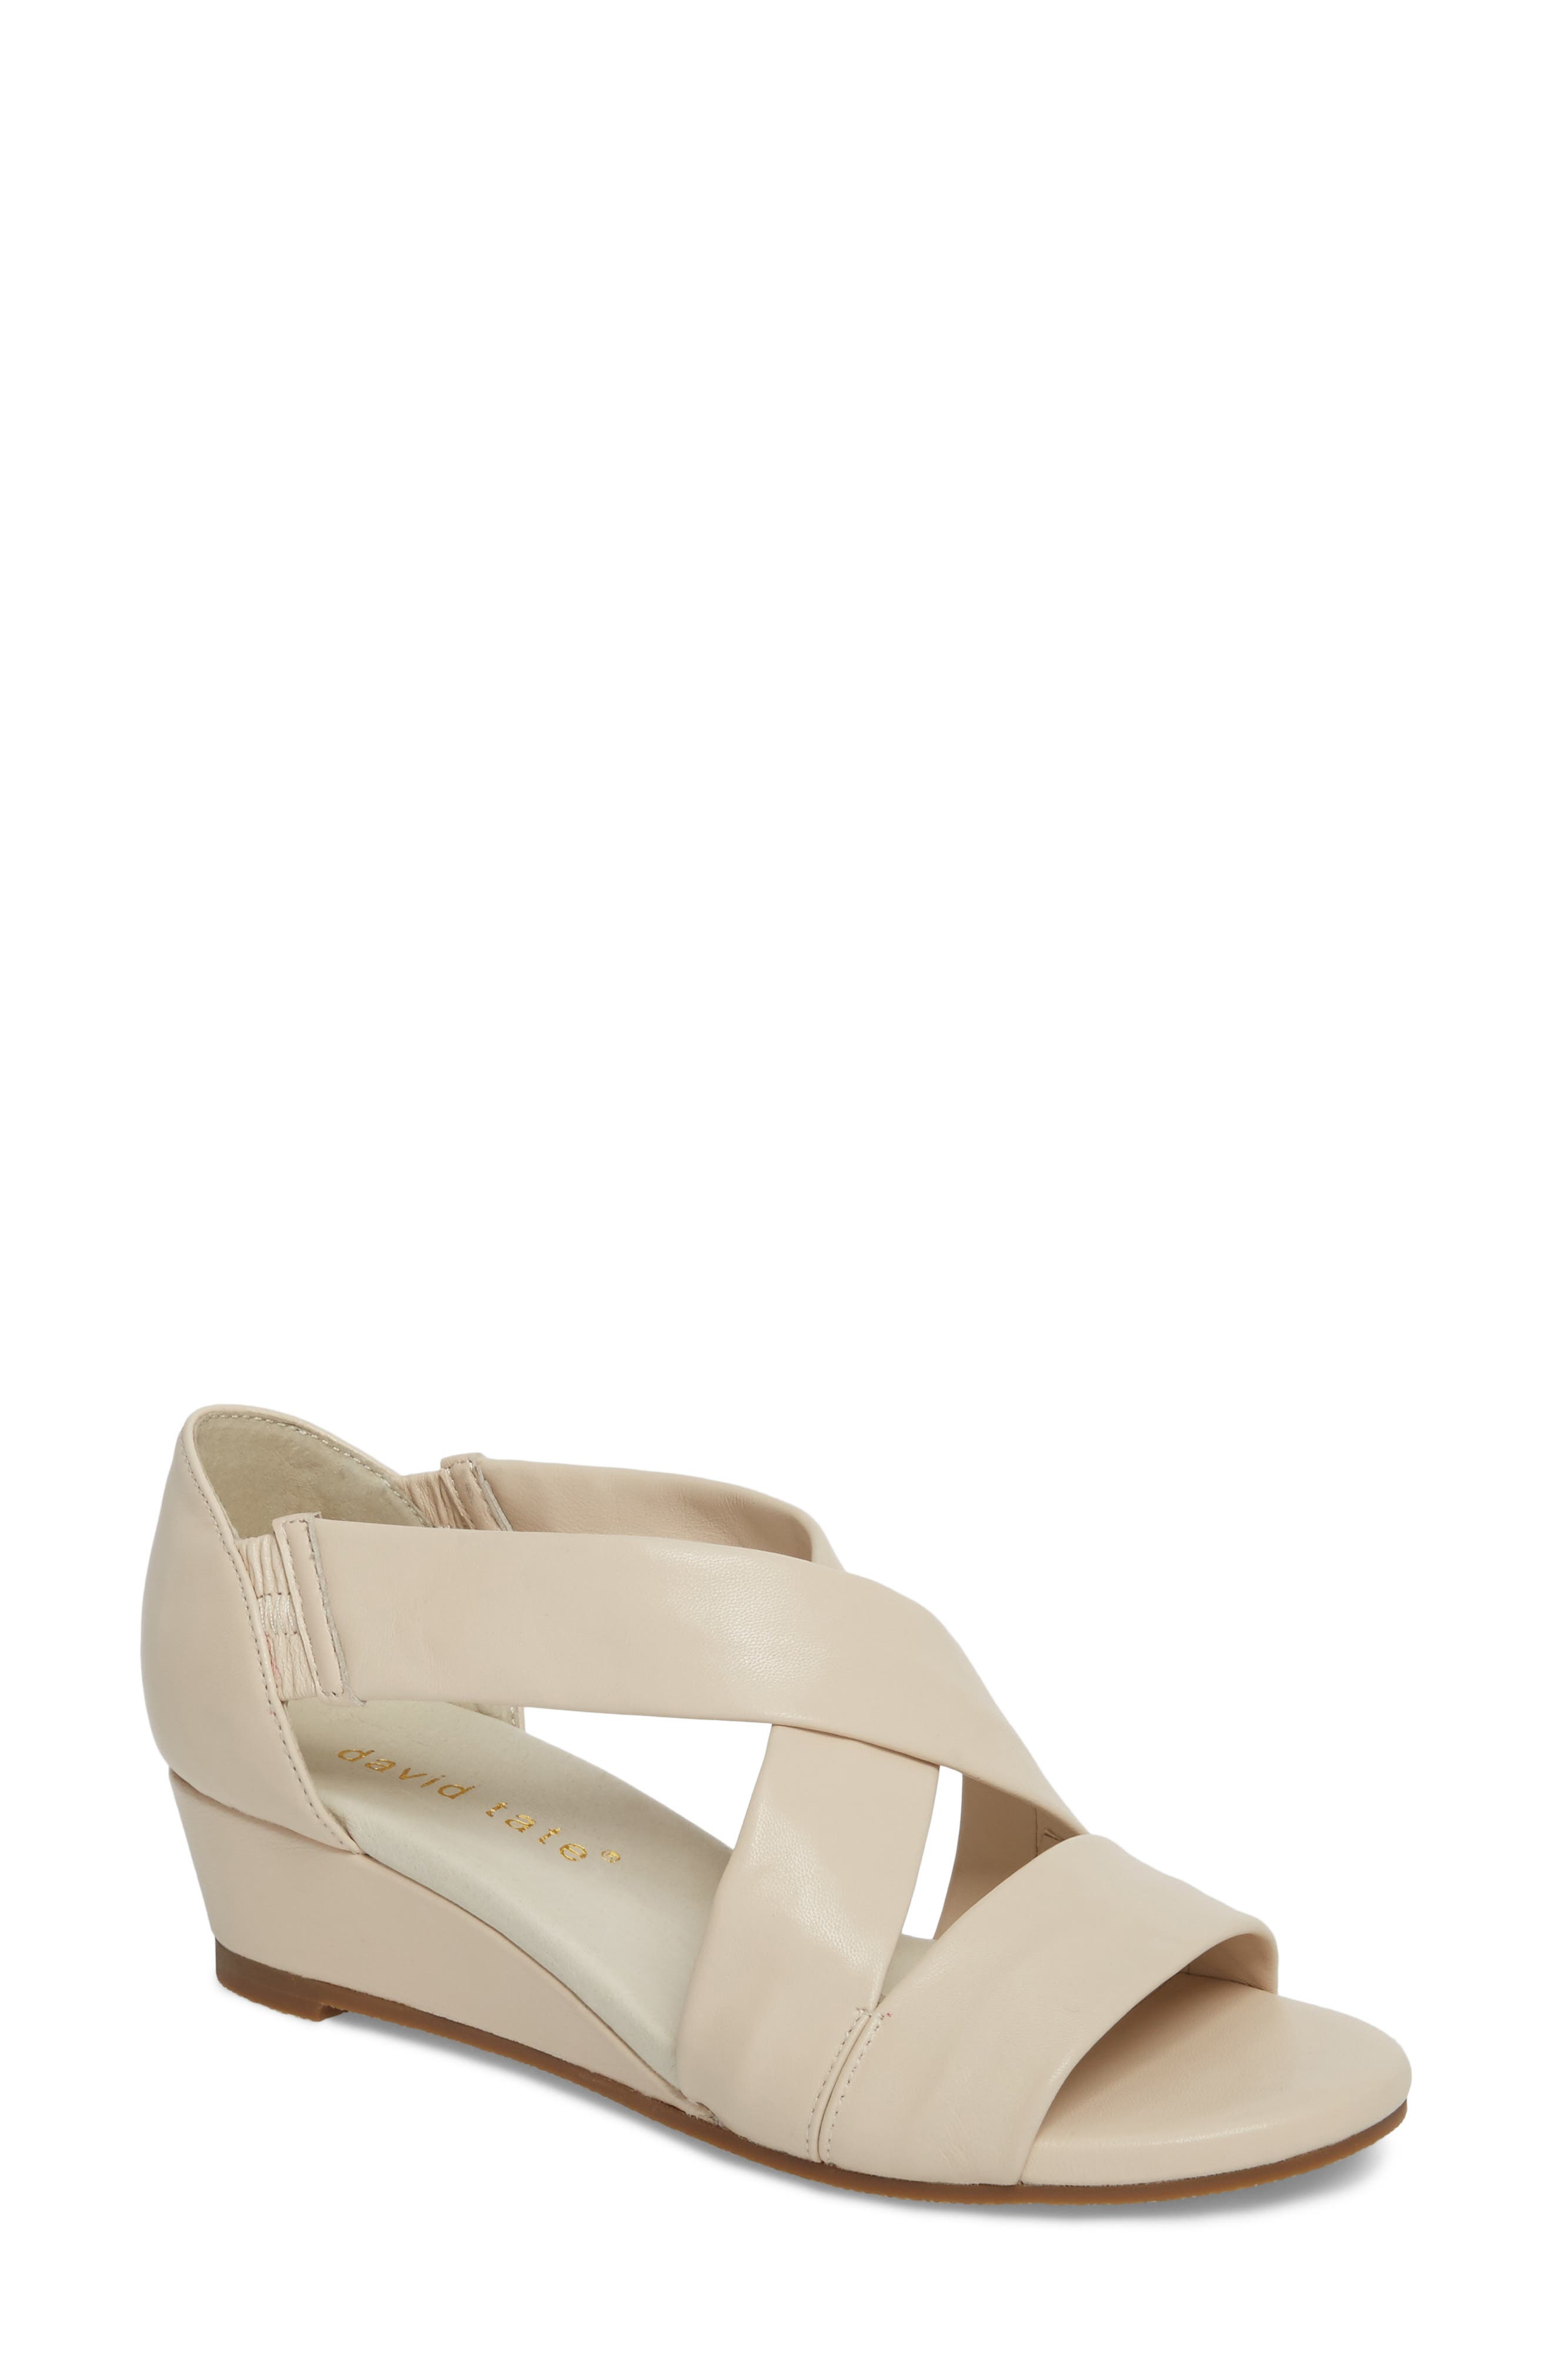 Swell Cross Strap Wedge Sandal,                         Main,                         color, Bone Leather